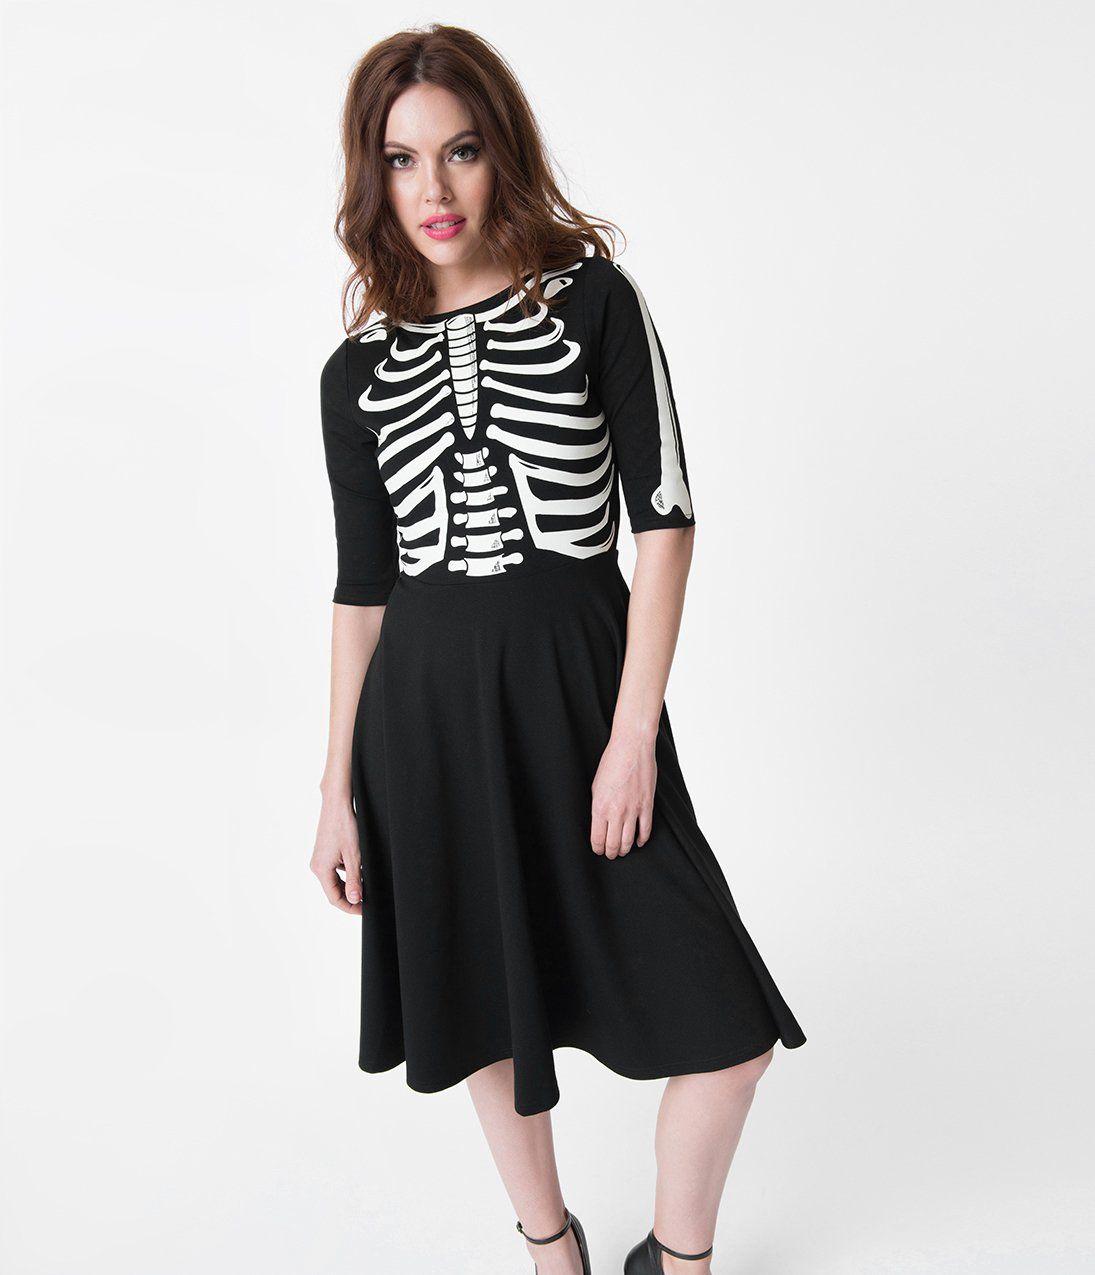 df6ea3e93e59 Unique Vintage Black Skeleton Bones Graves Swing Dress | Fashion ...